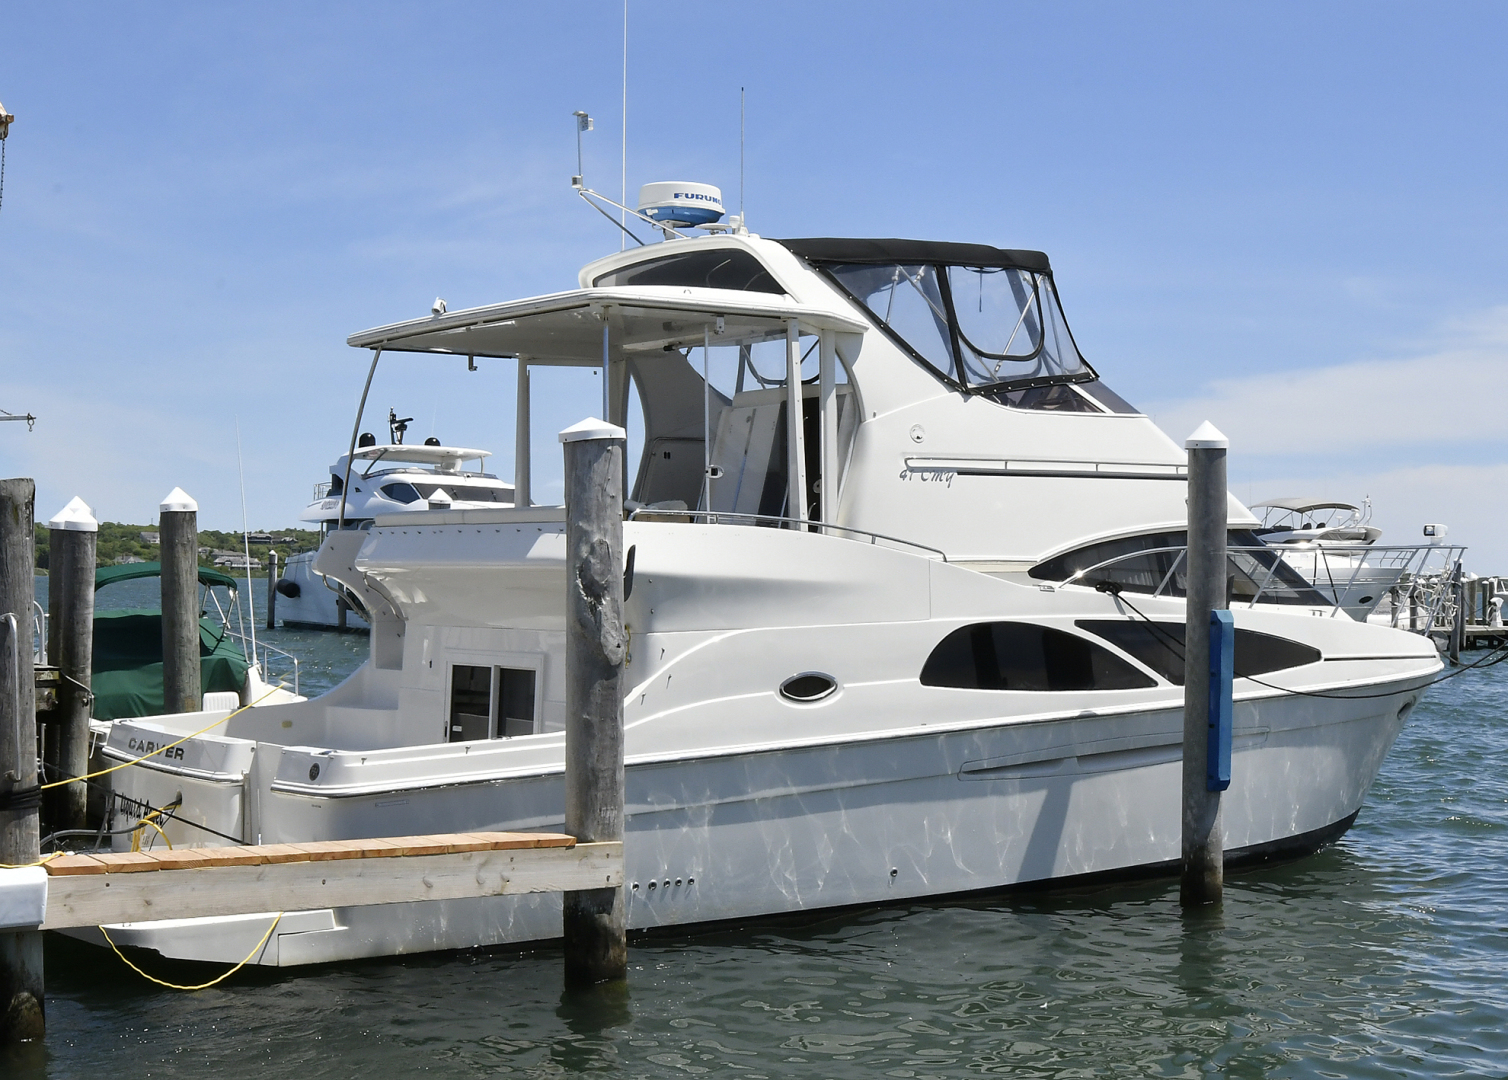 Carver-41 Cockpit Motor Yacht 2006-Uncle Joe Montauk-New York-United States-Starboard Side-1175332   Thumbnail